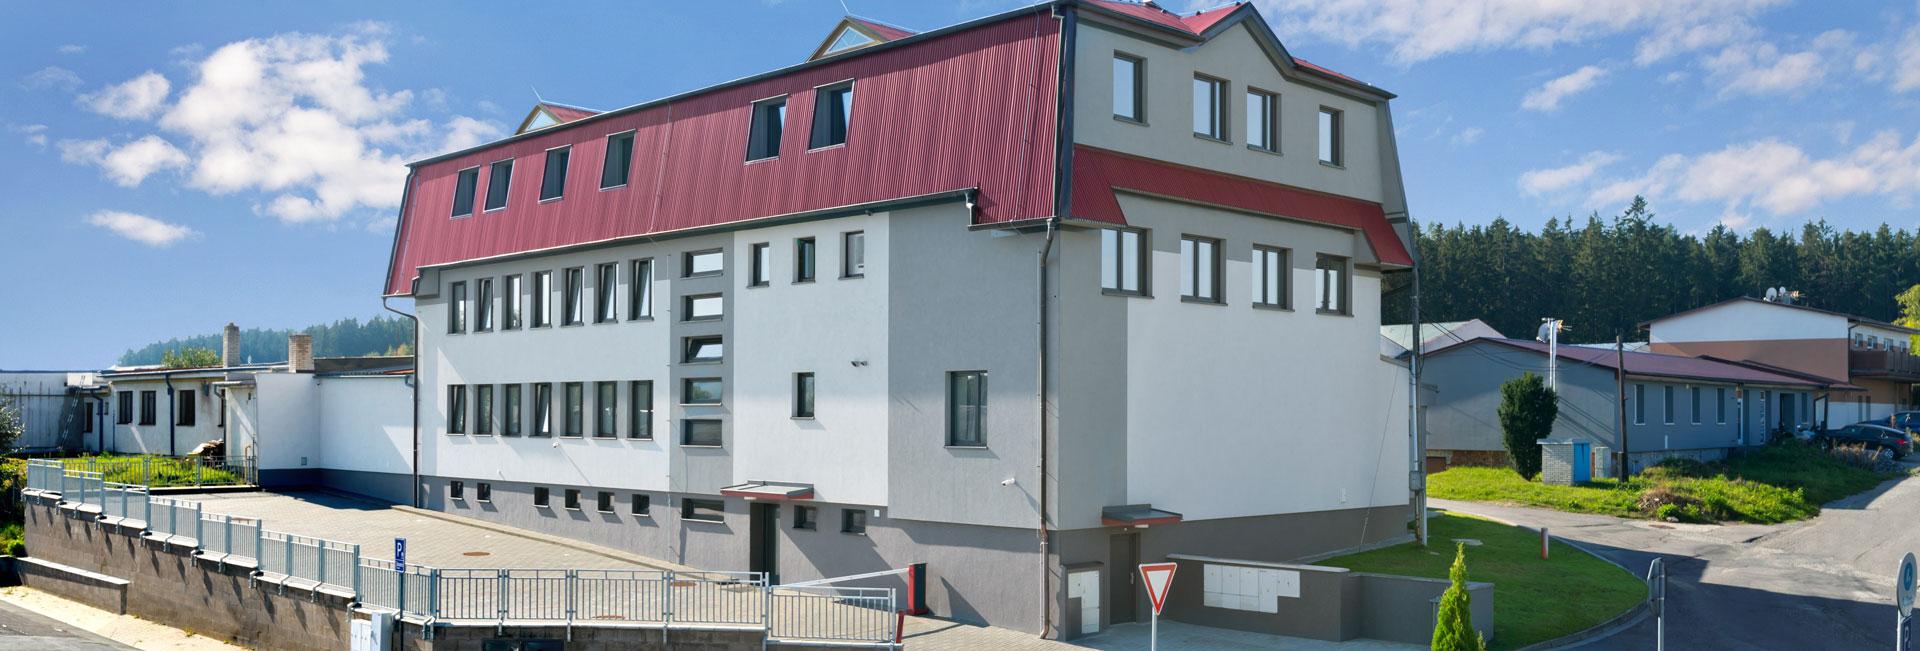 Hotel Ala-fabrika